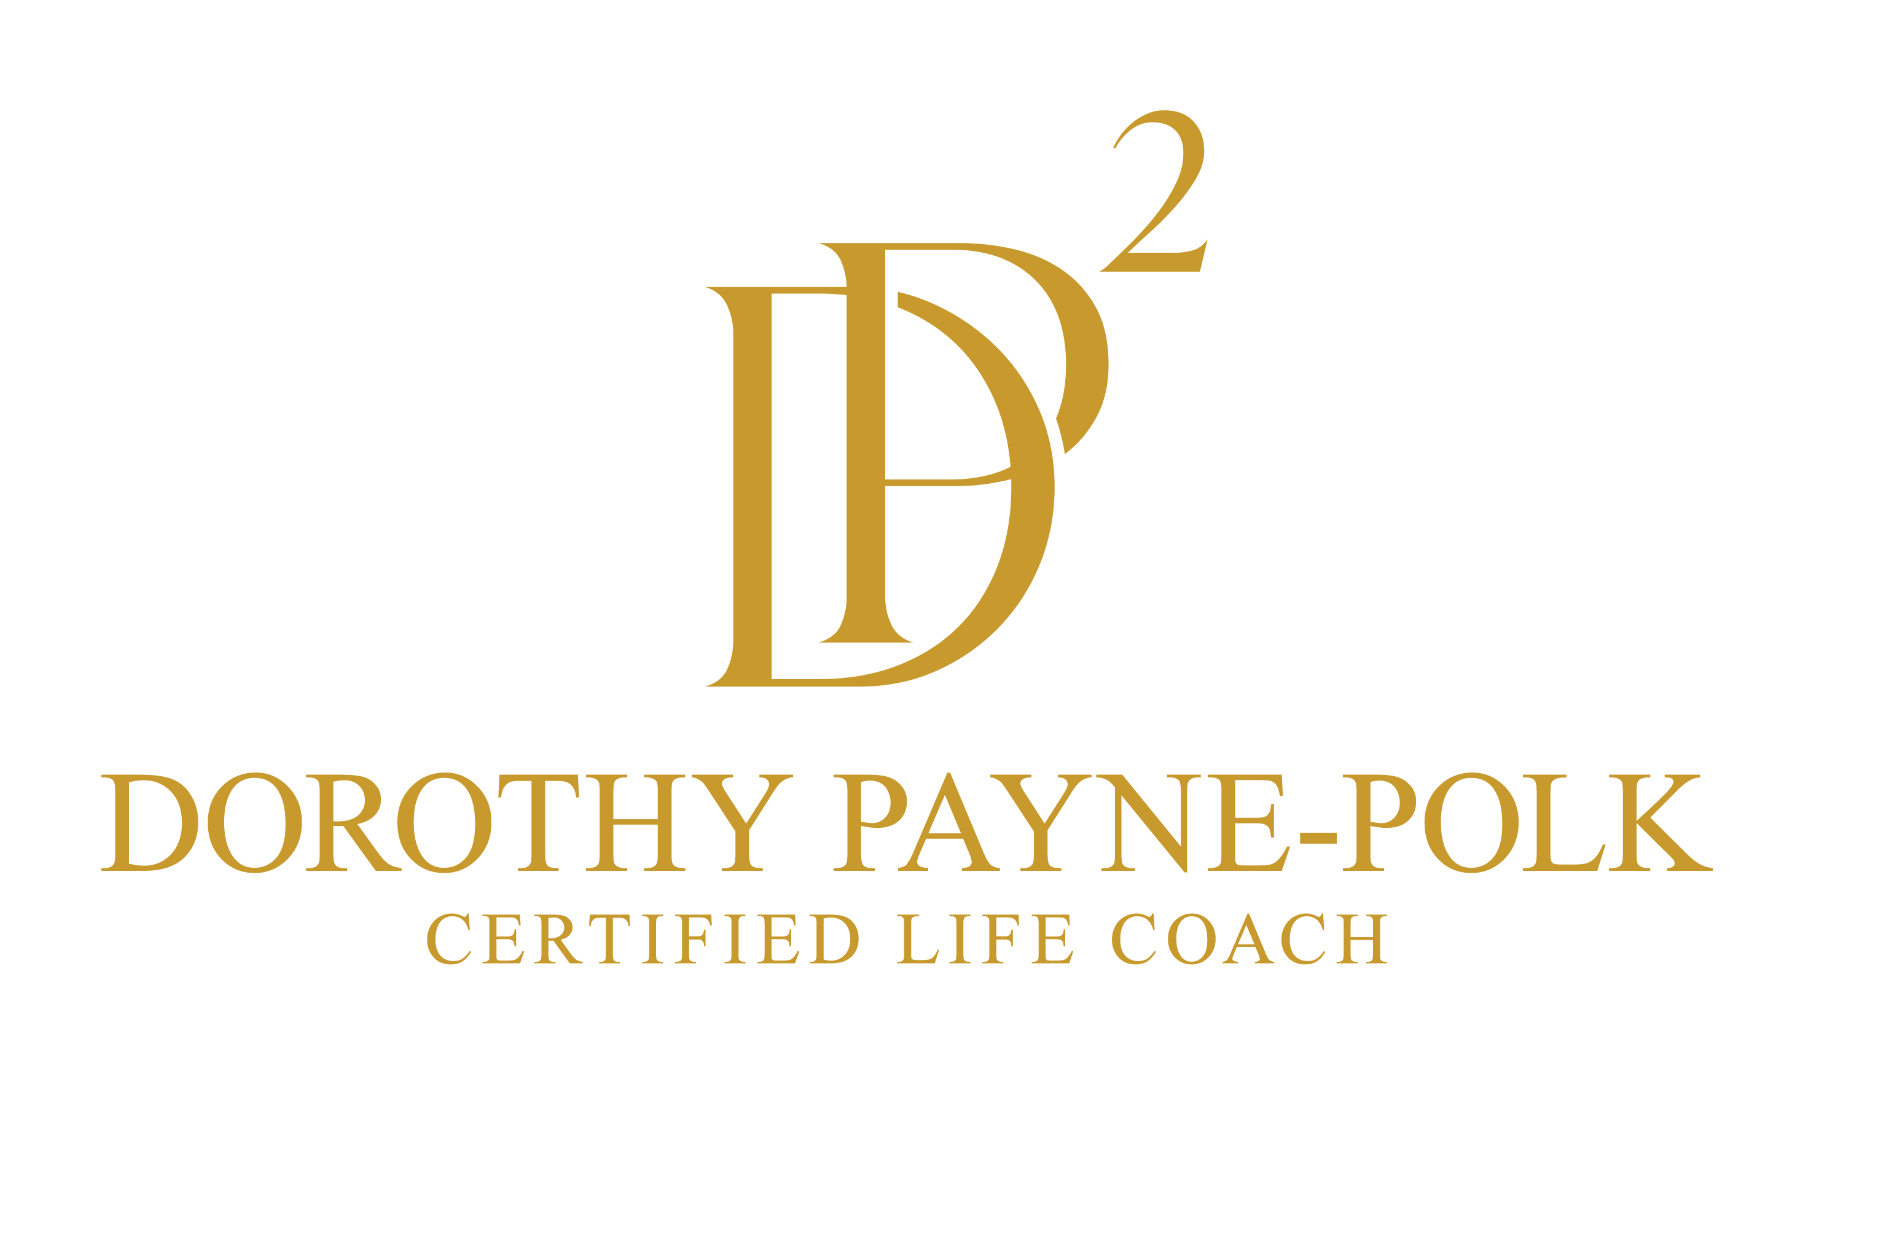 Dorothy Payne-Polk